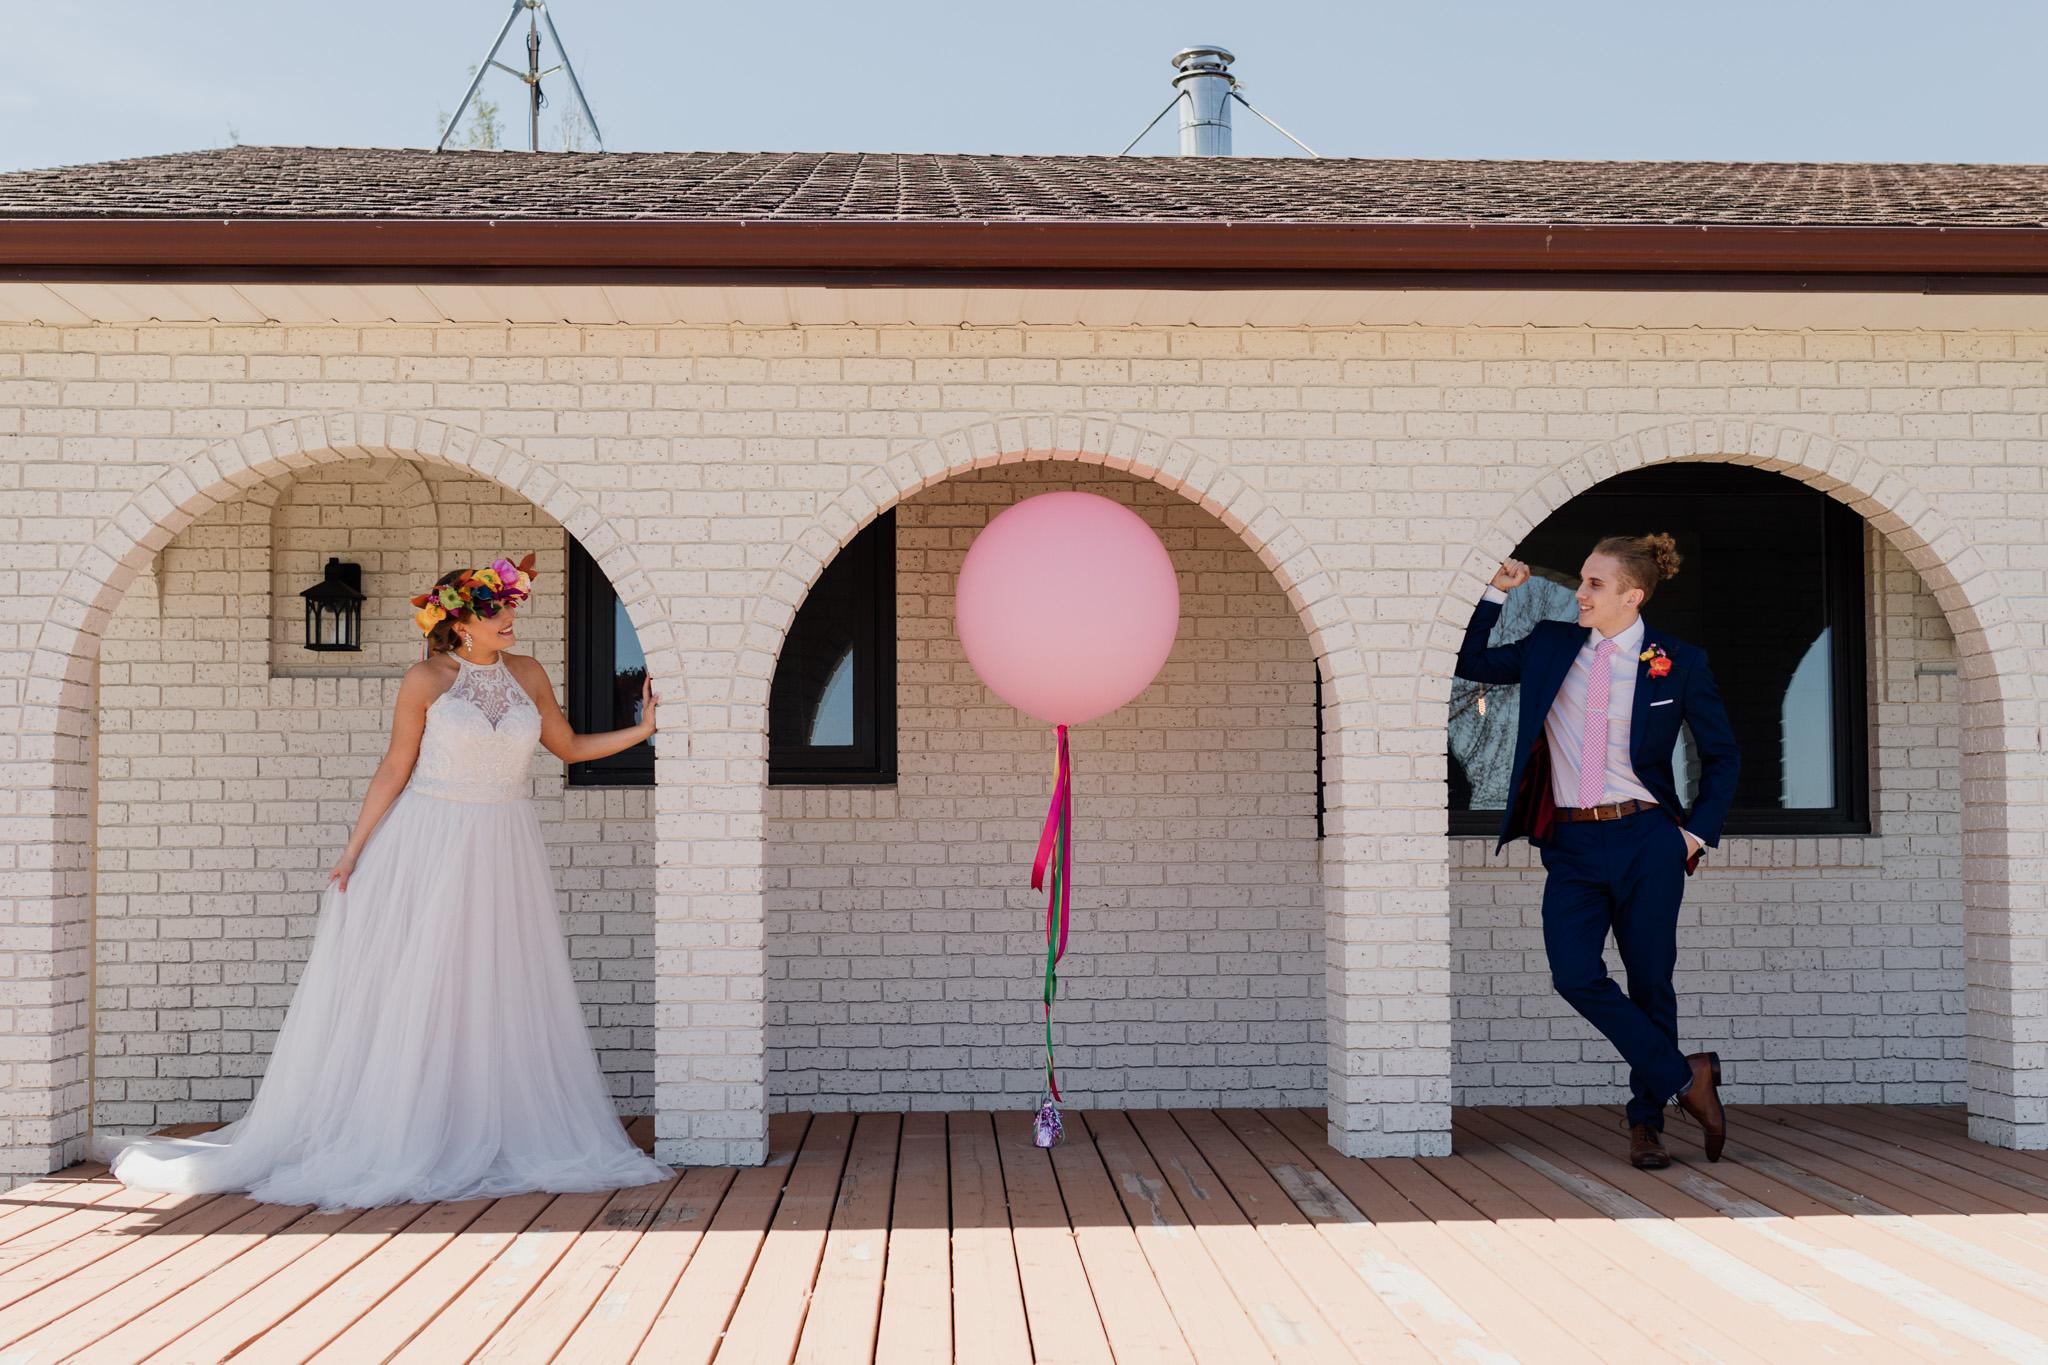 winnipeg-wedding-starlit point-31.jpg